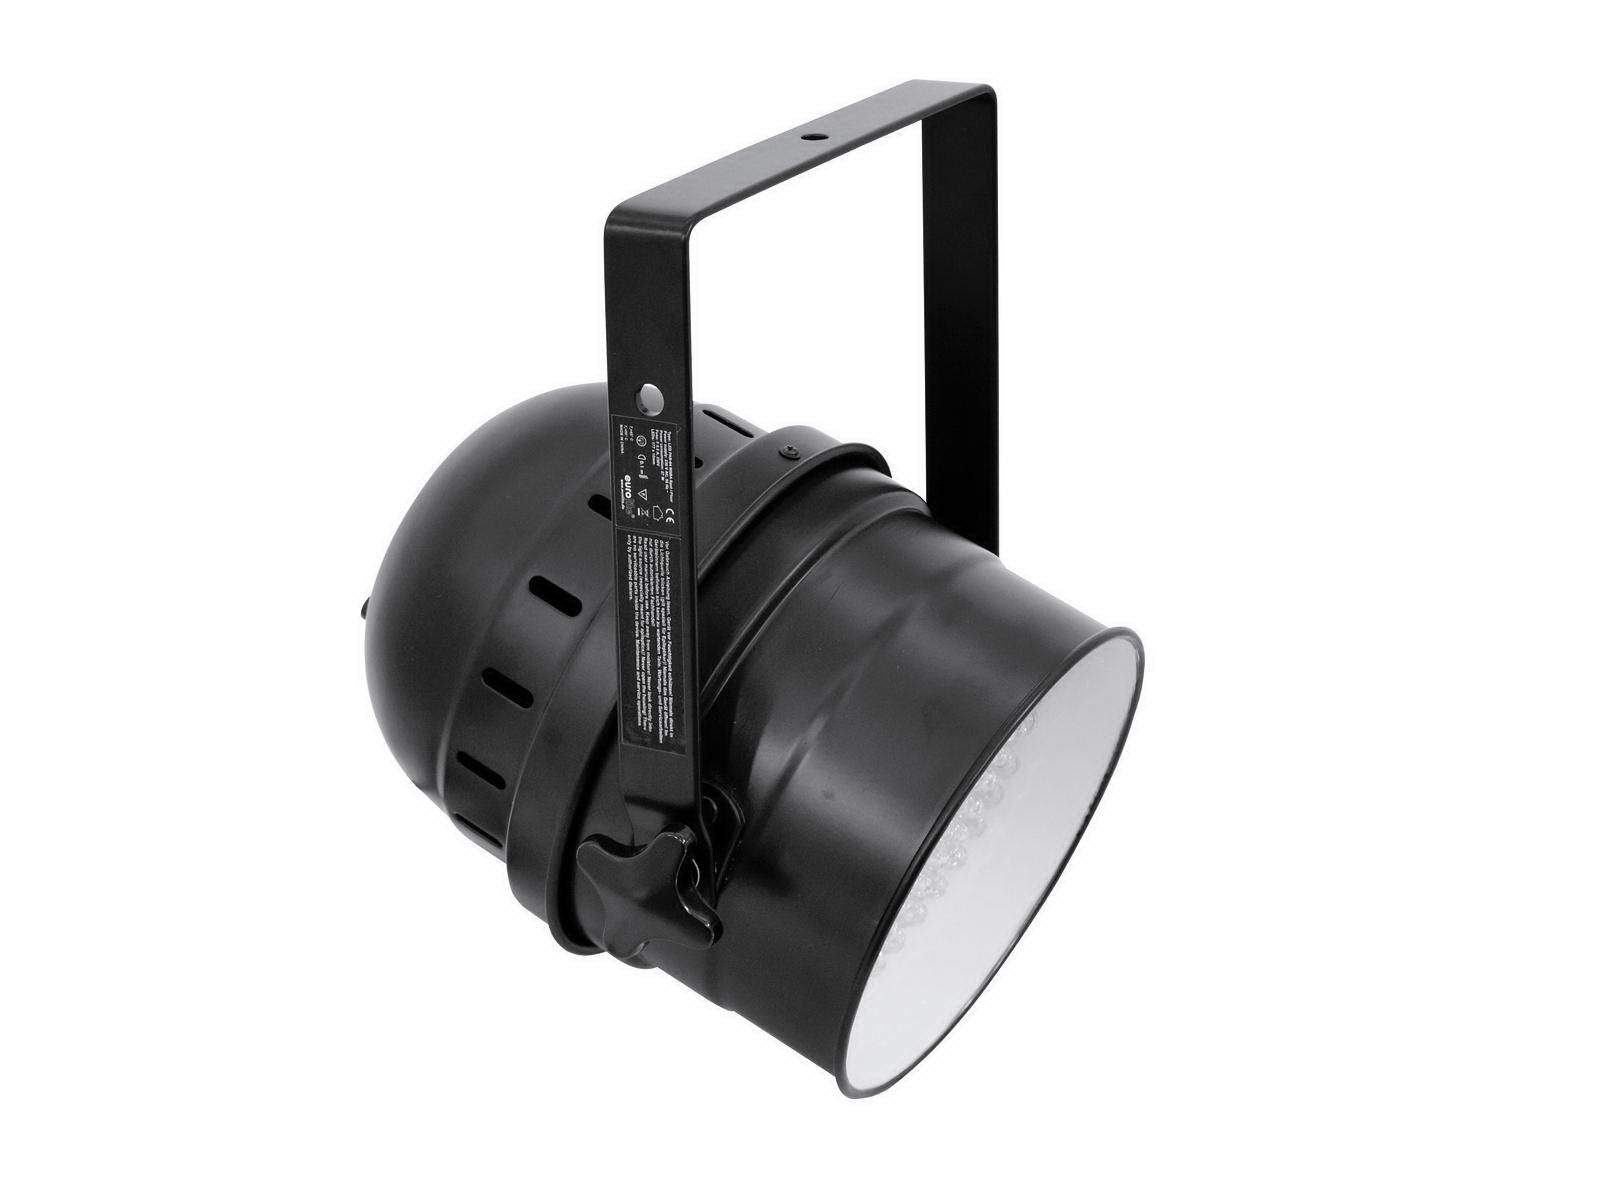 LED Prožektor LED Prožektor  LED PAR RGBA  27W  36°